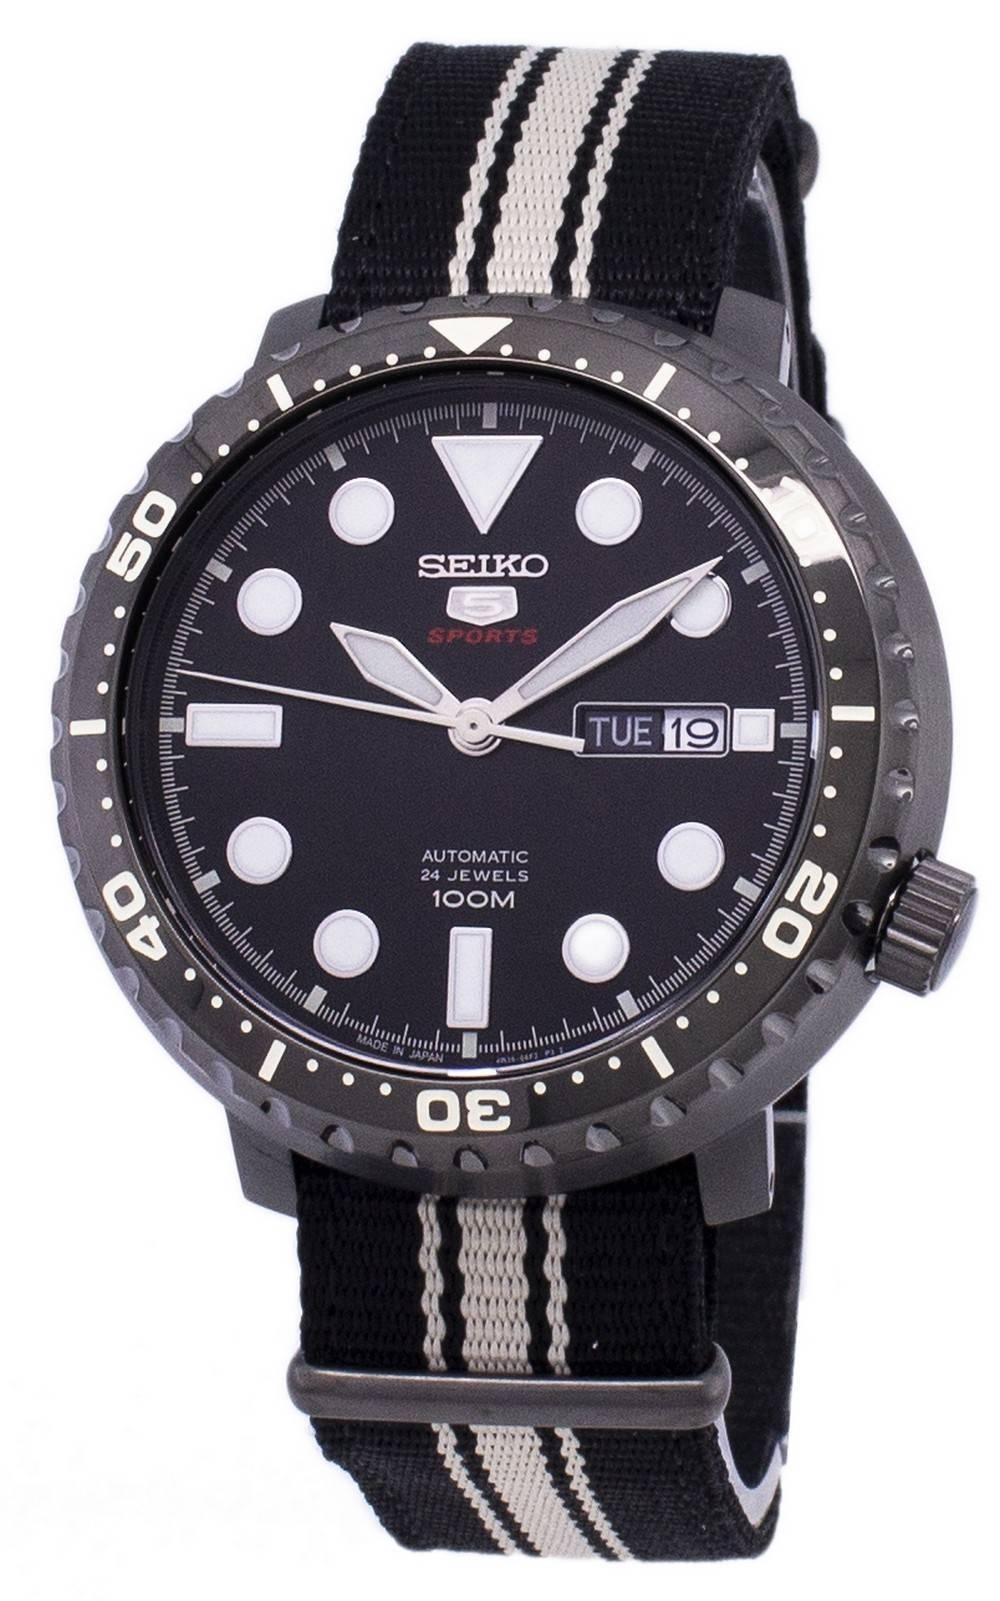 Seiko-5-Sports-Automatic-Japan-Made-SRPC67-SRPC67J1-SRPC67J-Mens-Watch